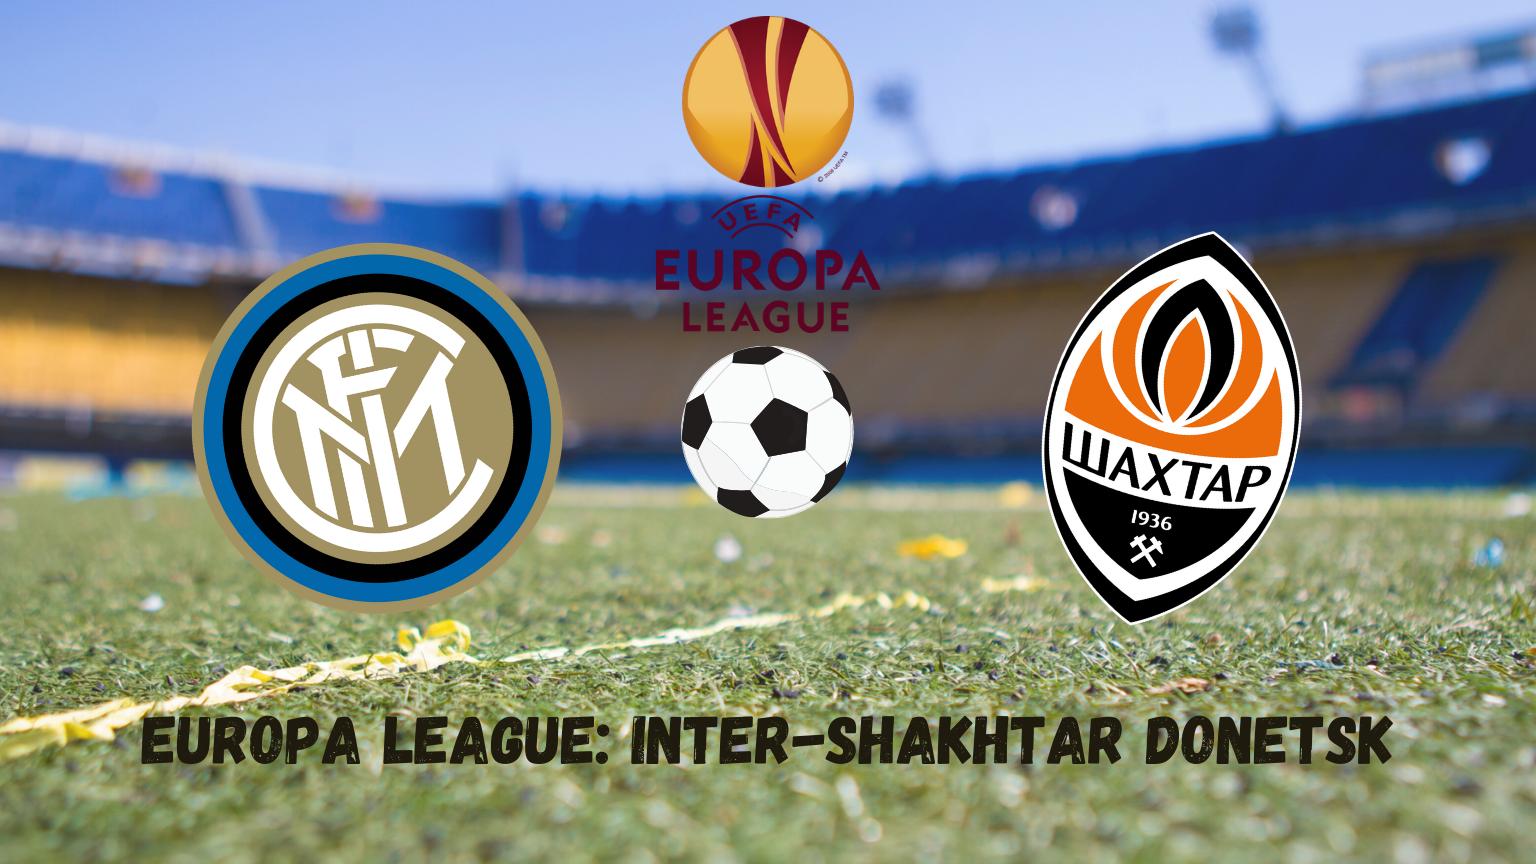 Pronostici Europa League: Inter-Shakhtar